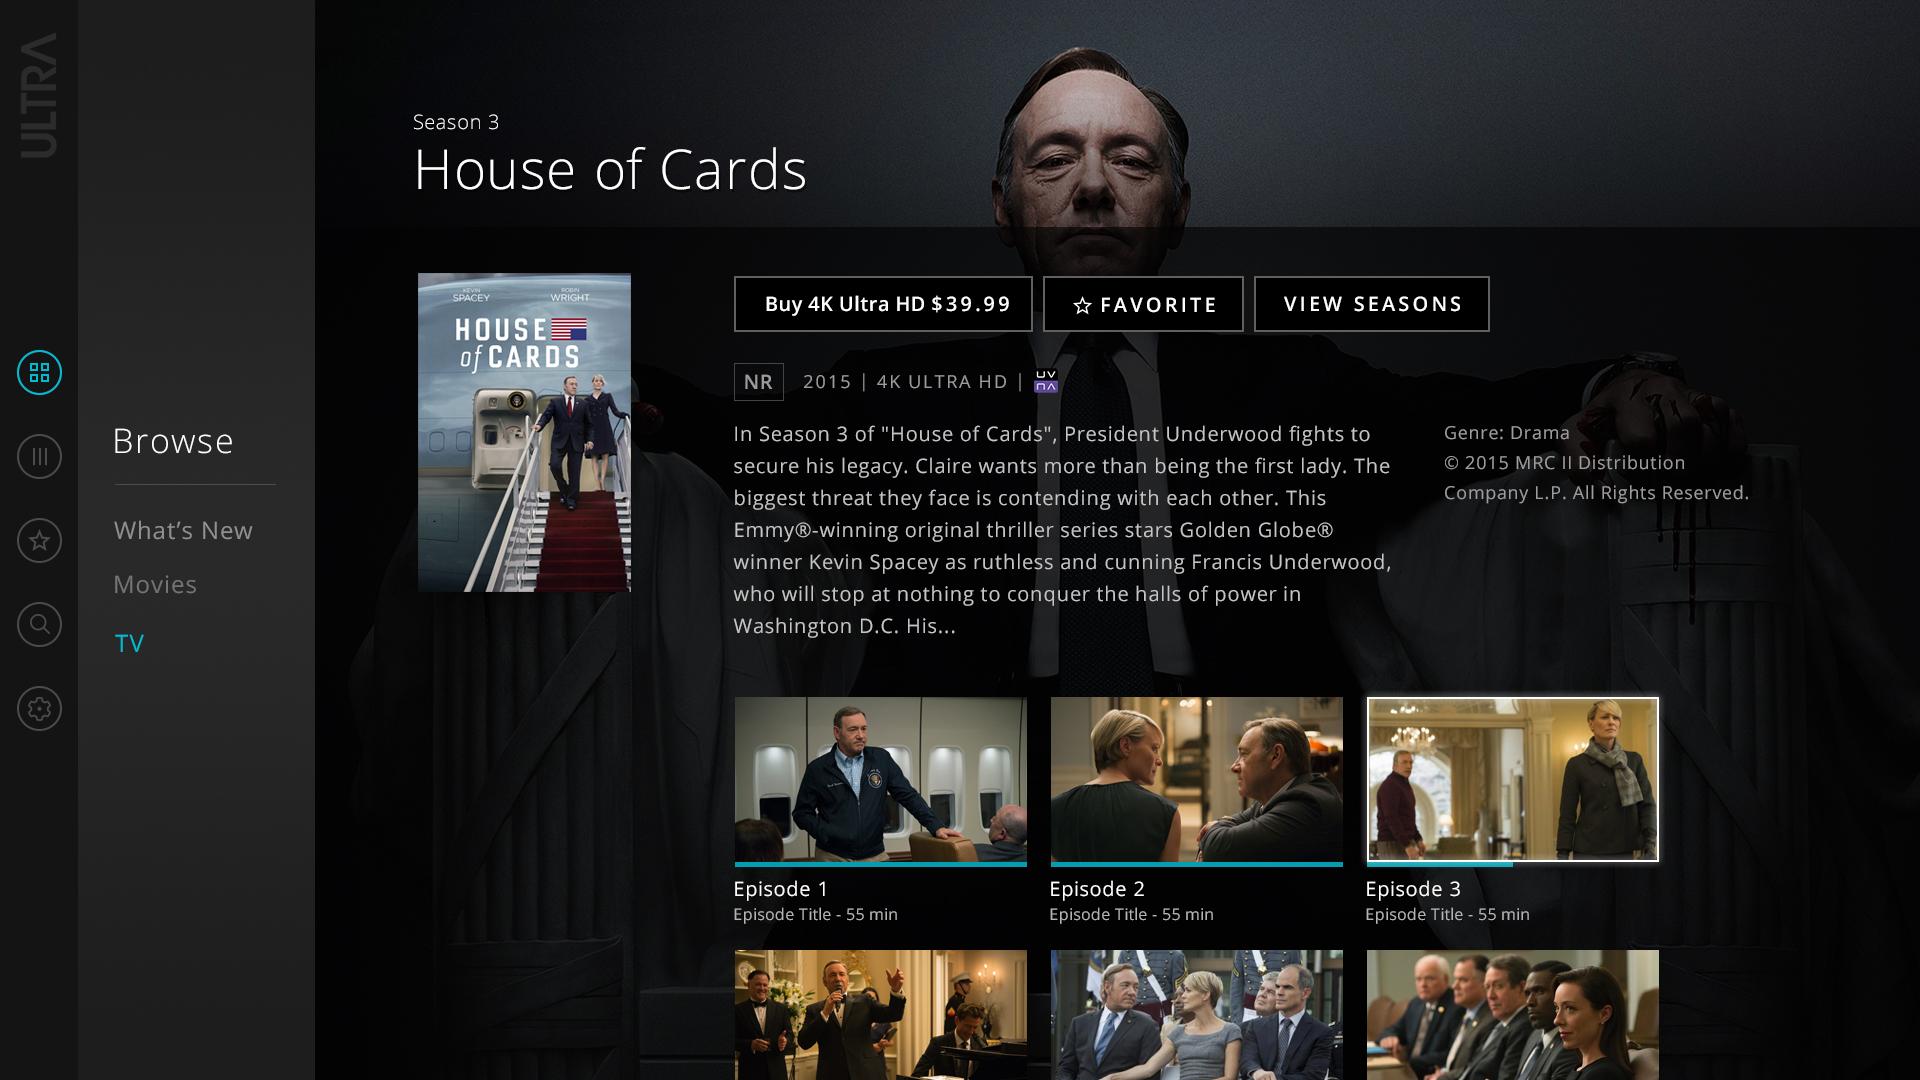 TV season detail